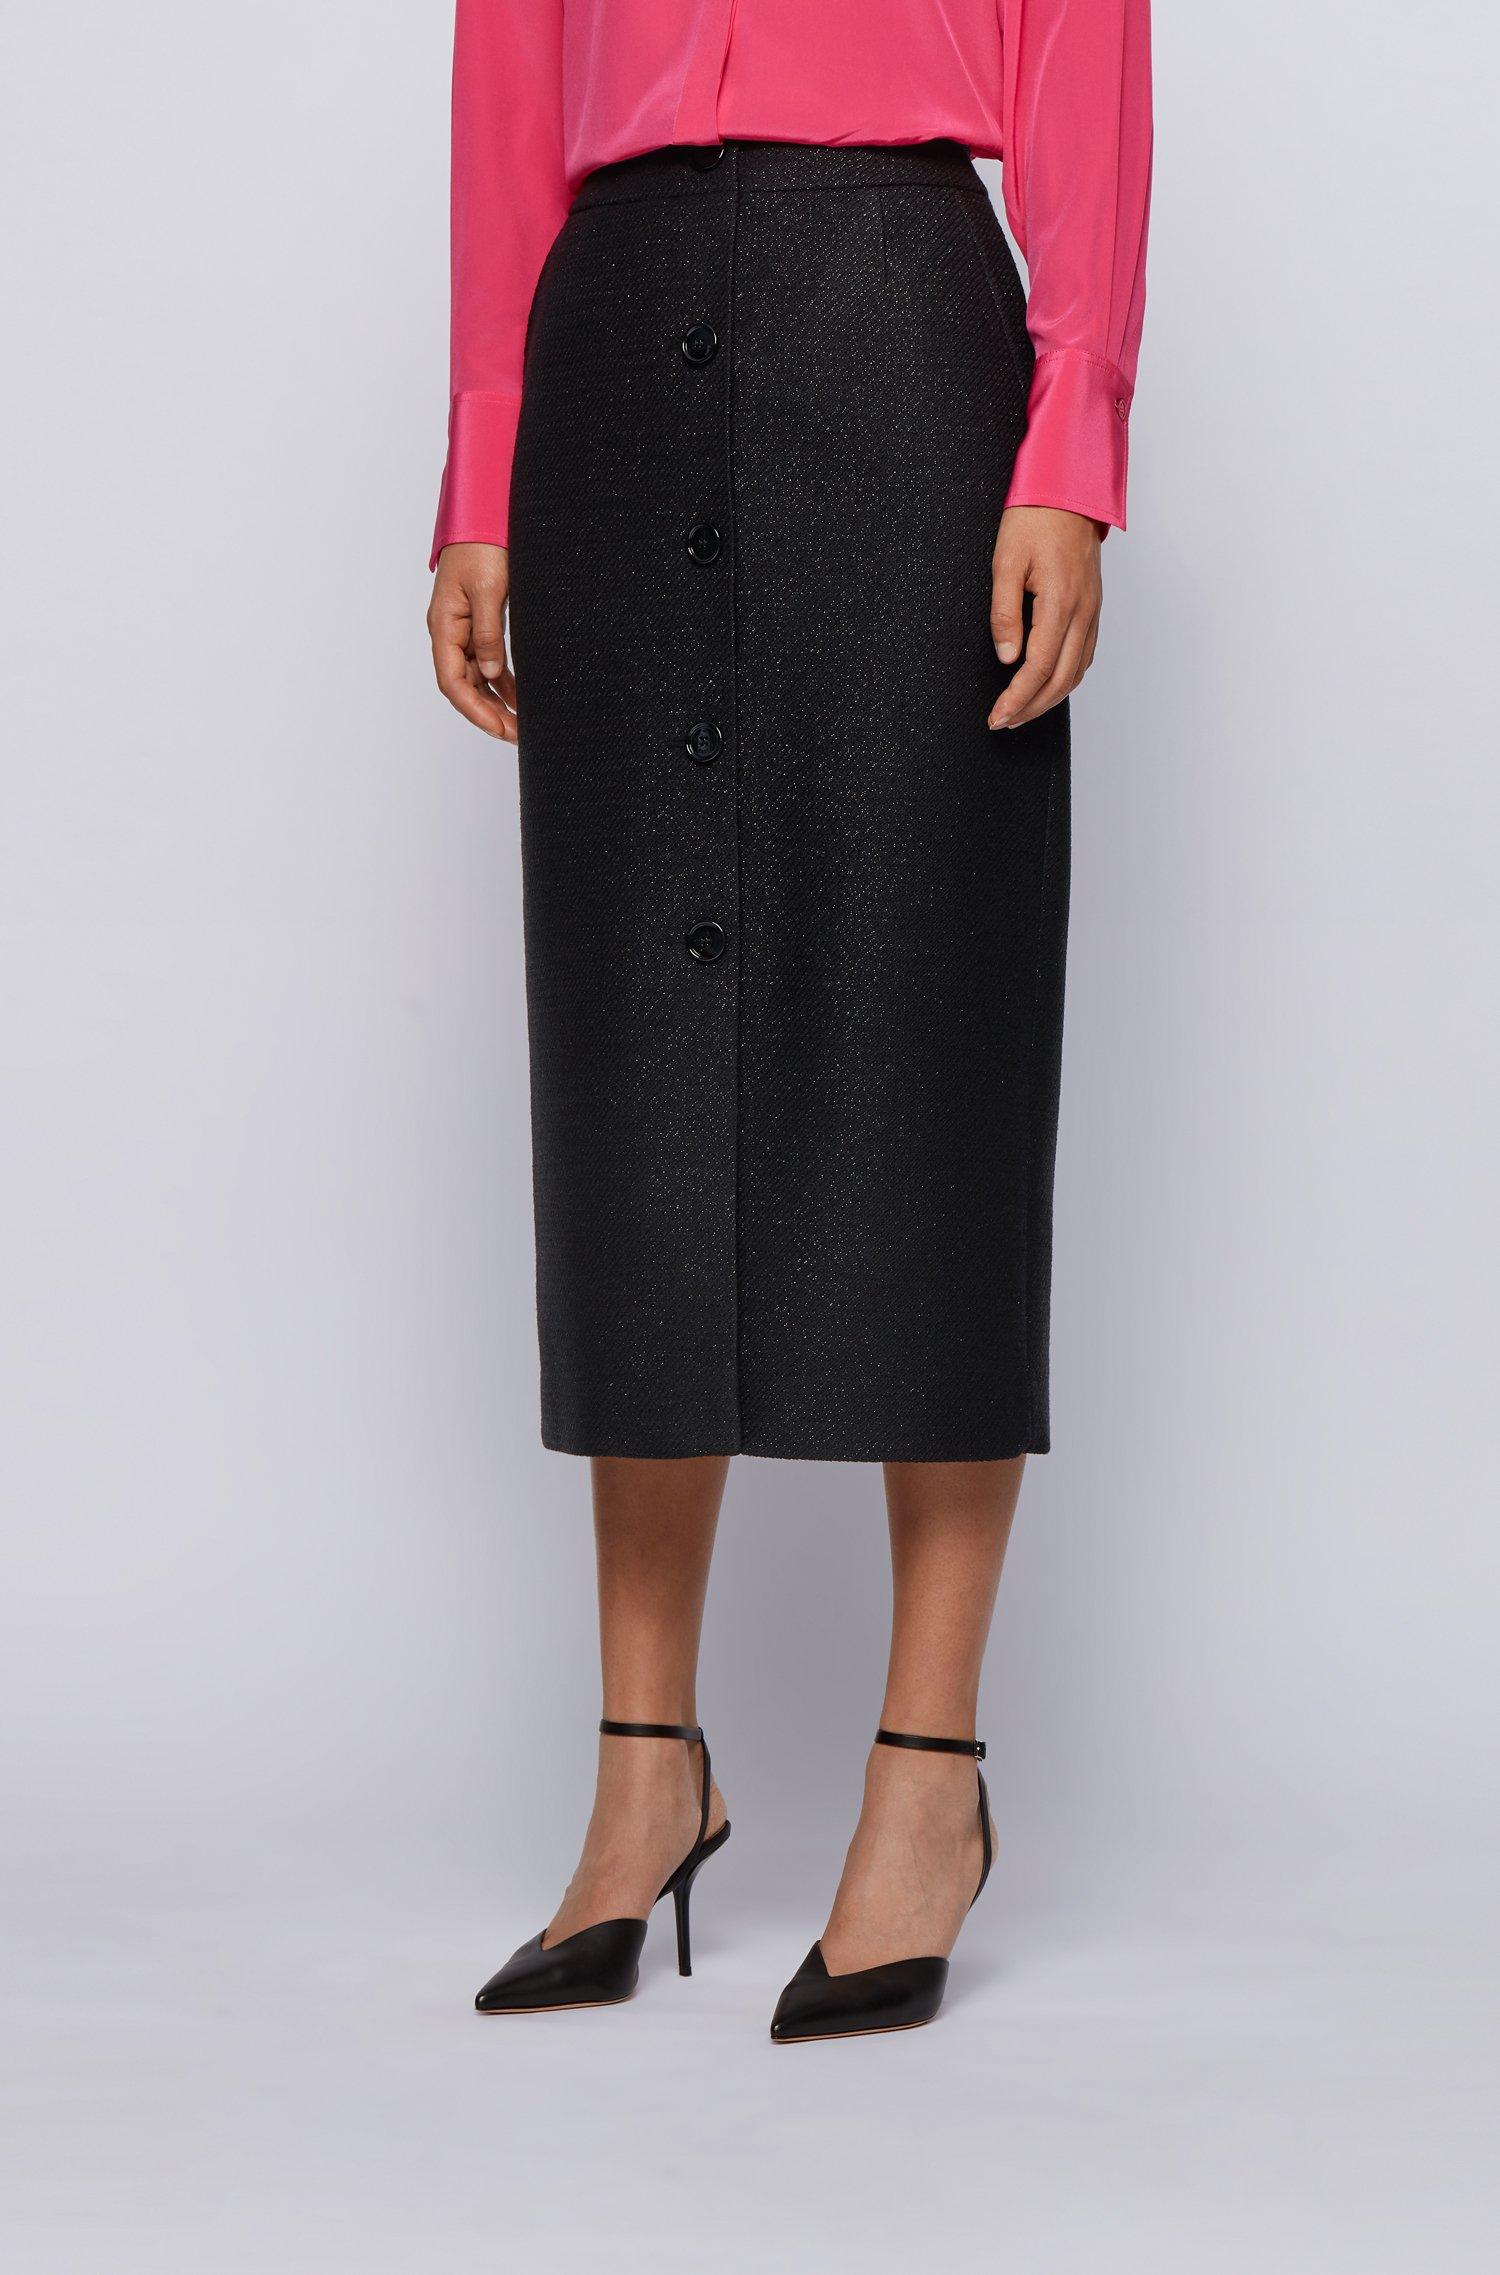 Midi-length button-through pencil skirt in metallised tweed, Black